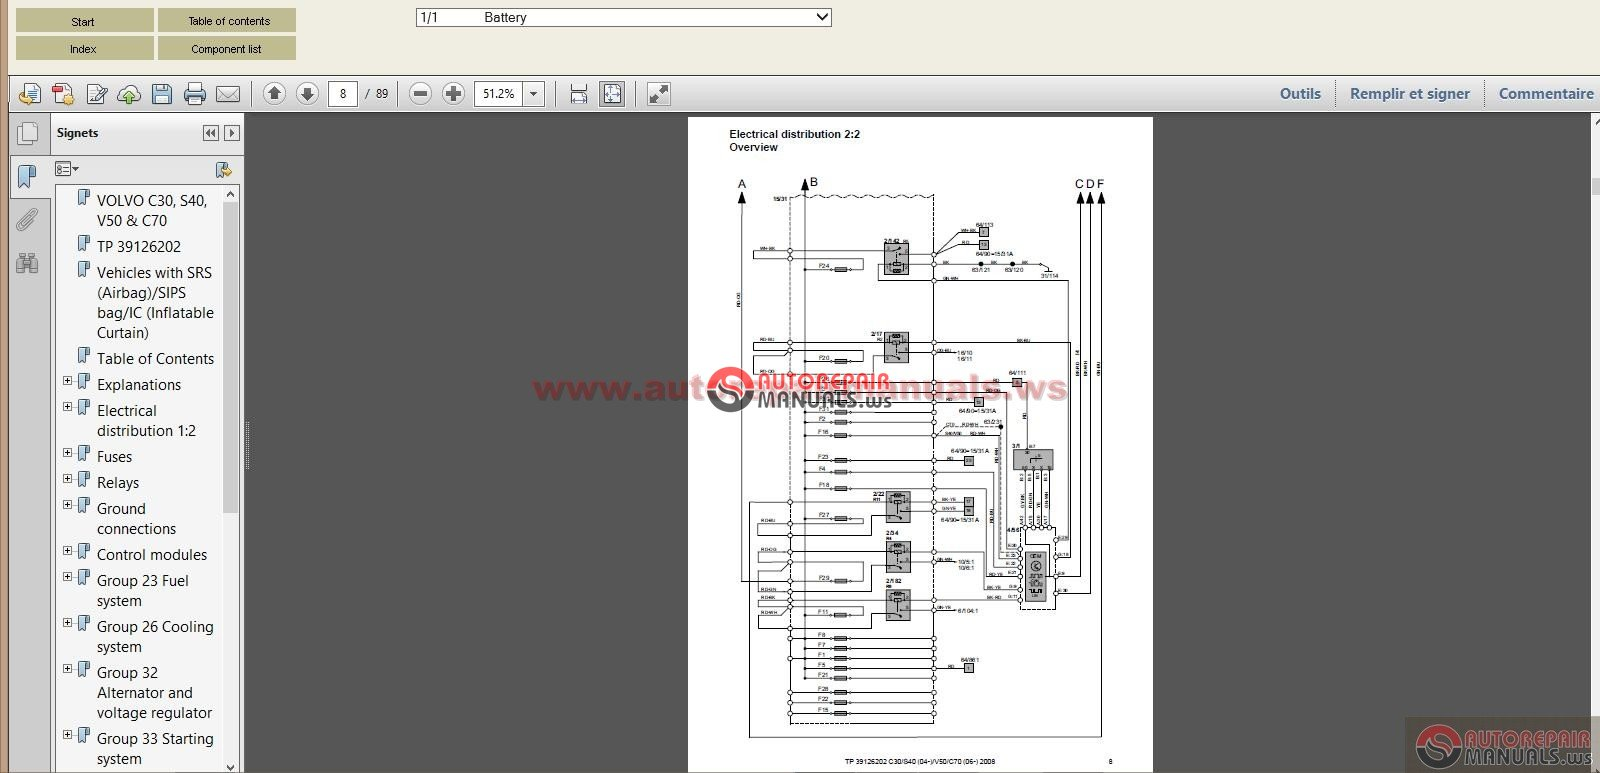 hight resolution of 2011 volvo xc60 wiring diagram 2011 ford fiesta wiring